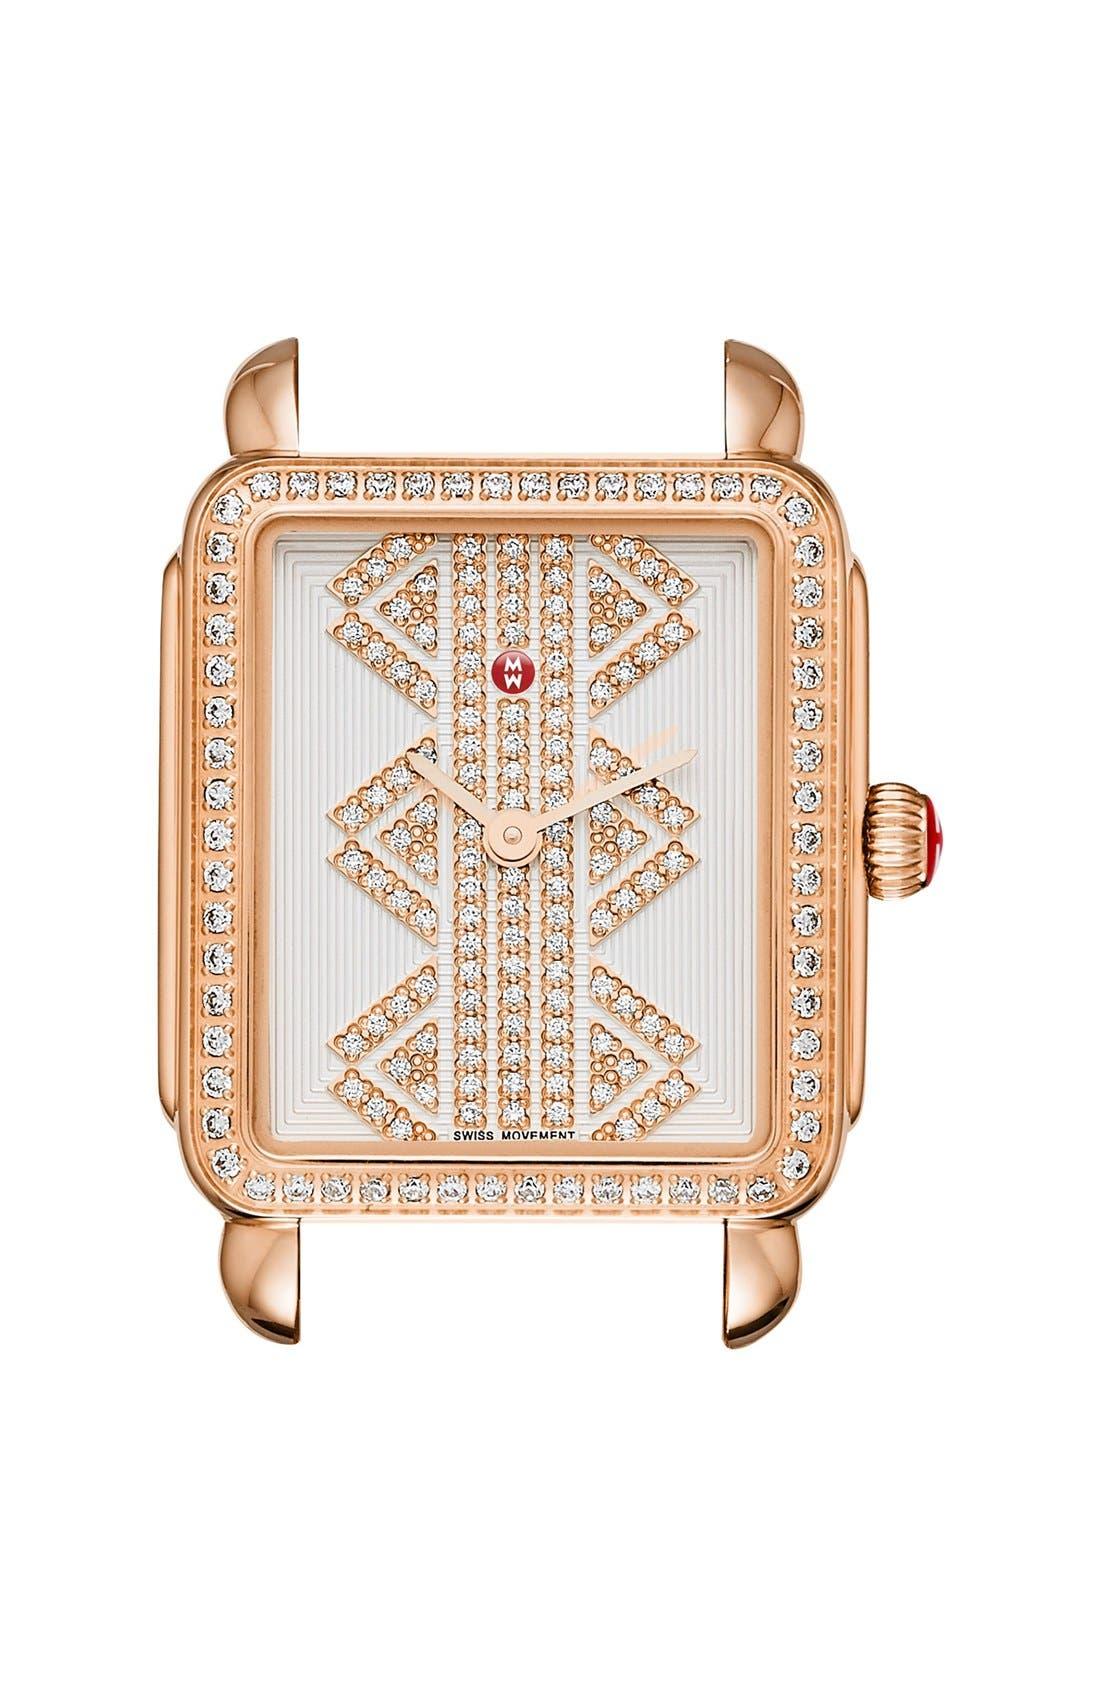 Main Image - MICHELE Deco II Mid Diamond Dial Watch Case, 26mm x 28mm